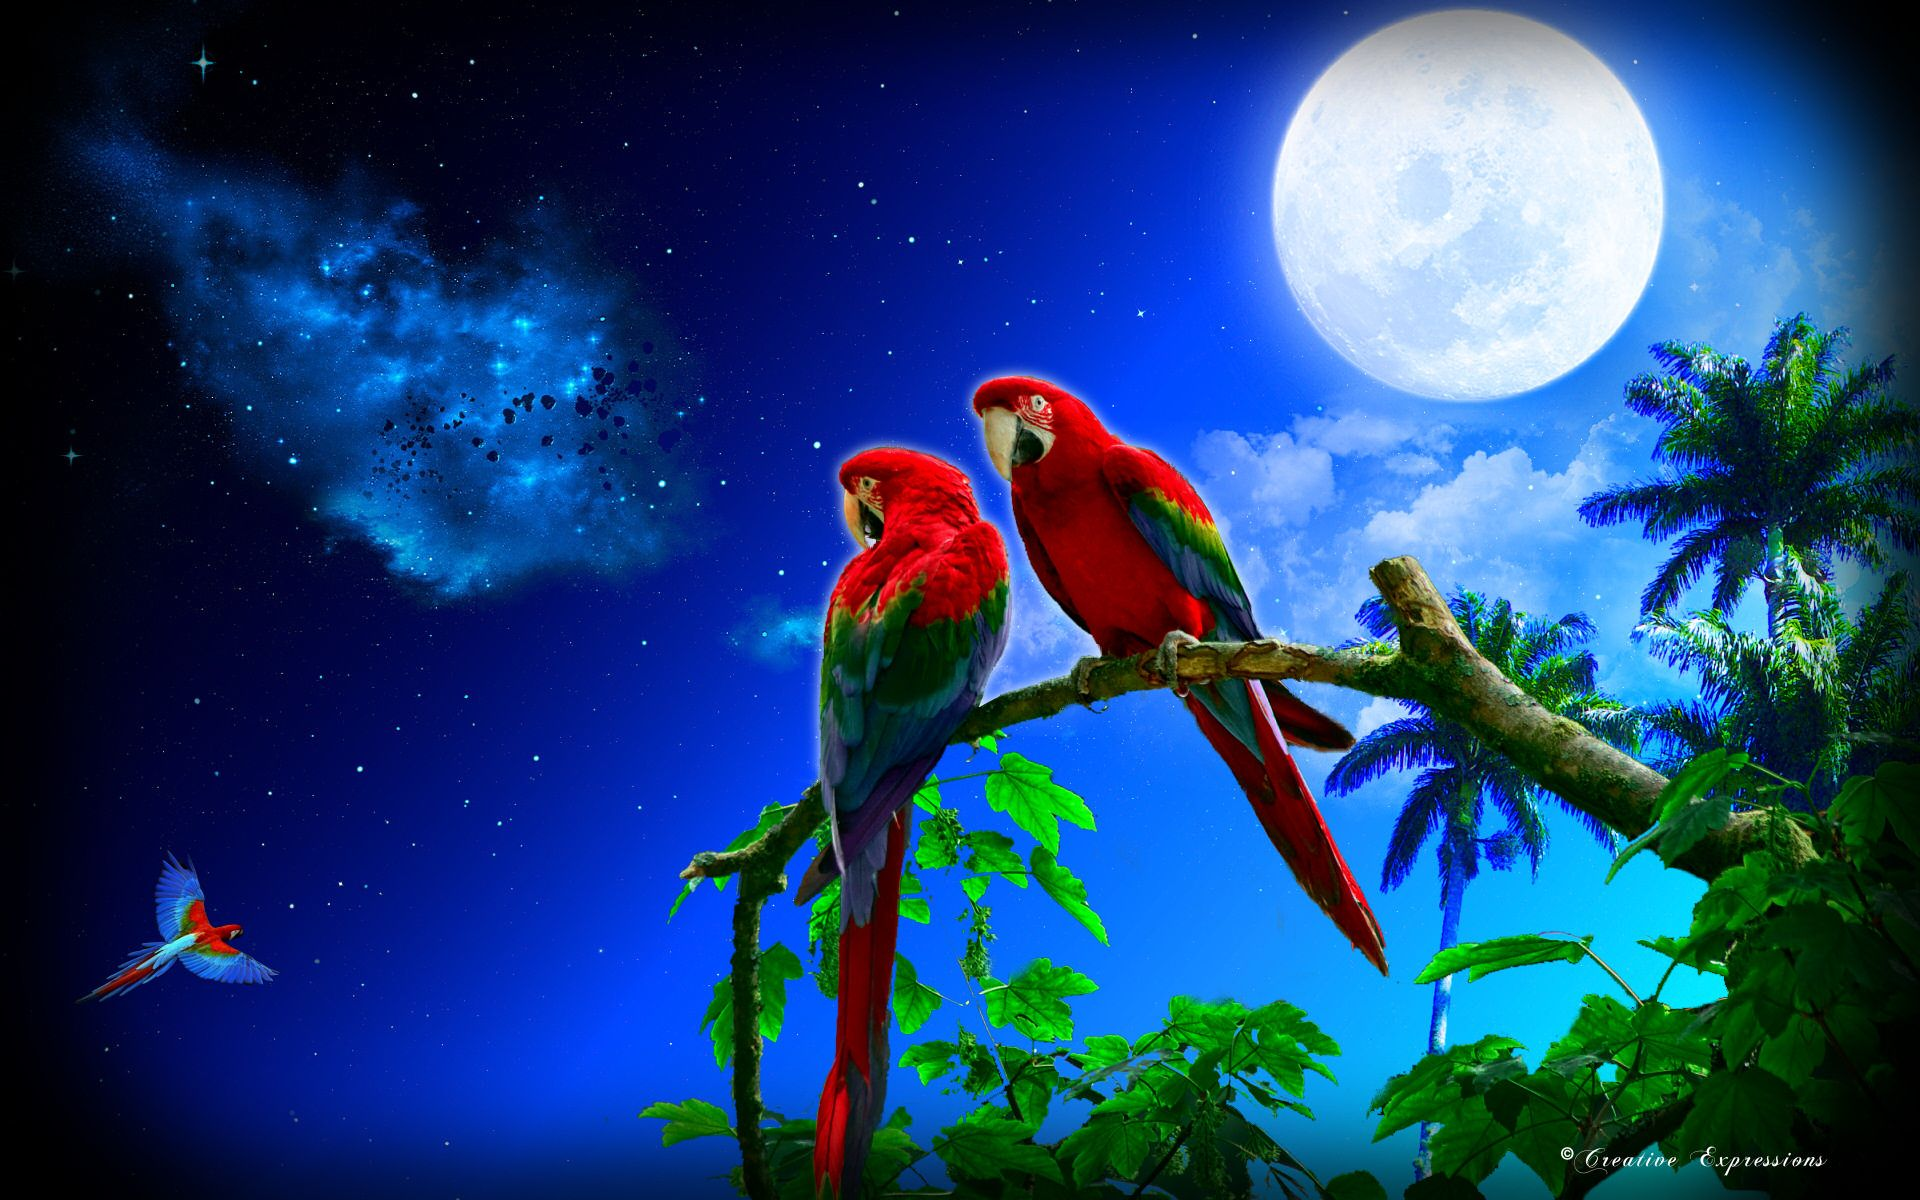 a parrots moon art nebula trees macaws hd wallpaper beautiful